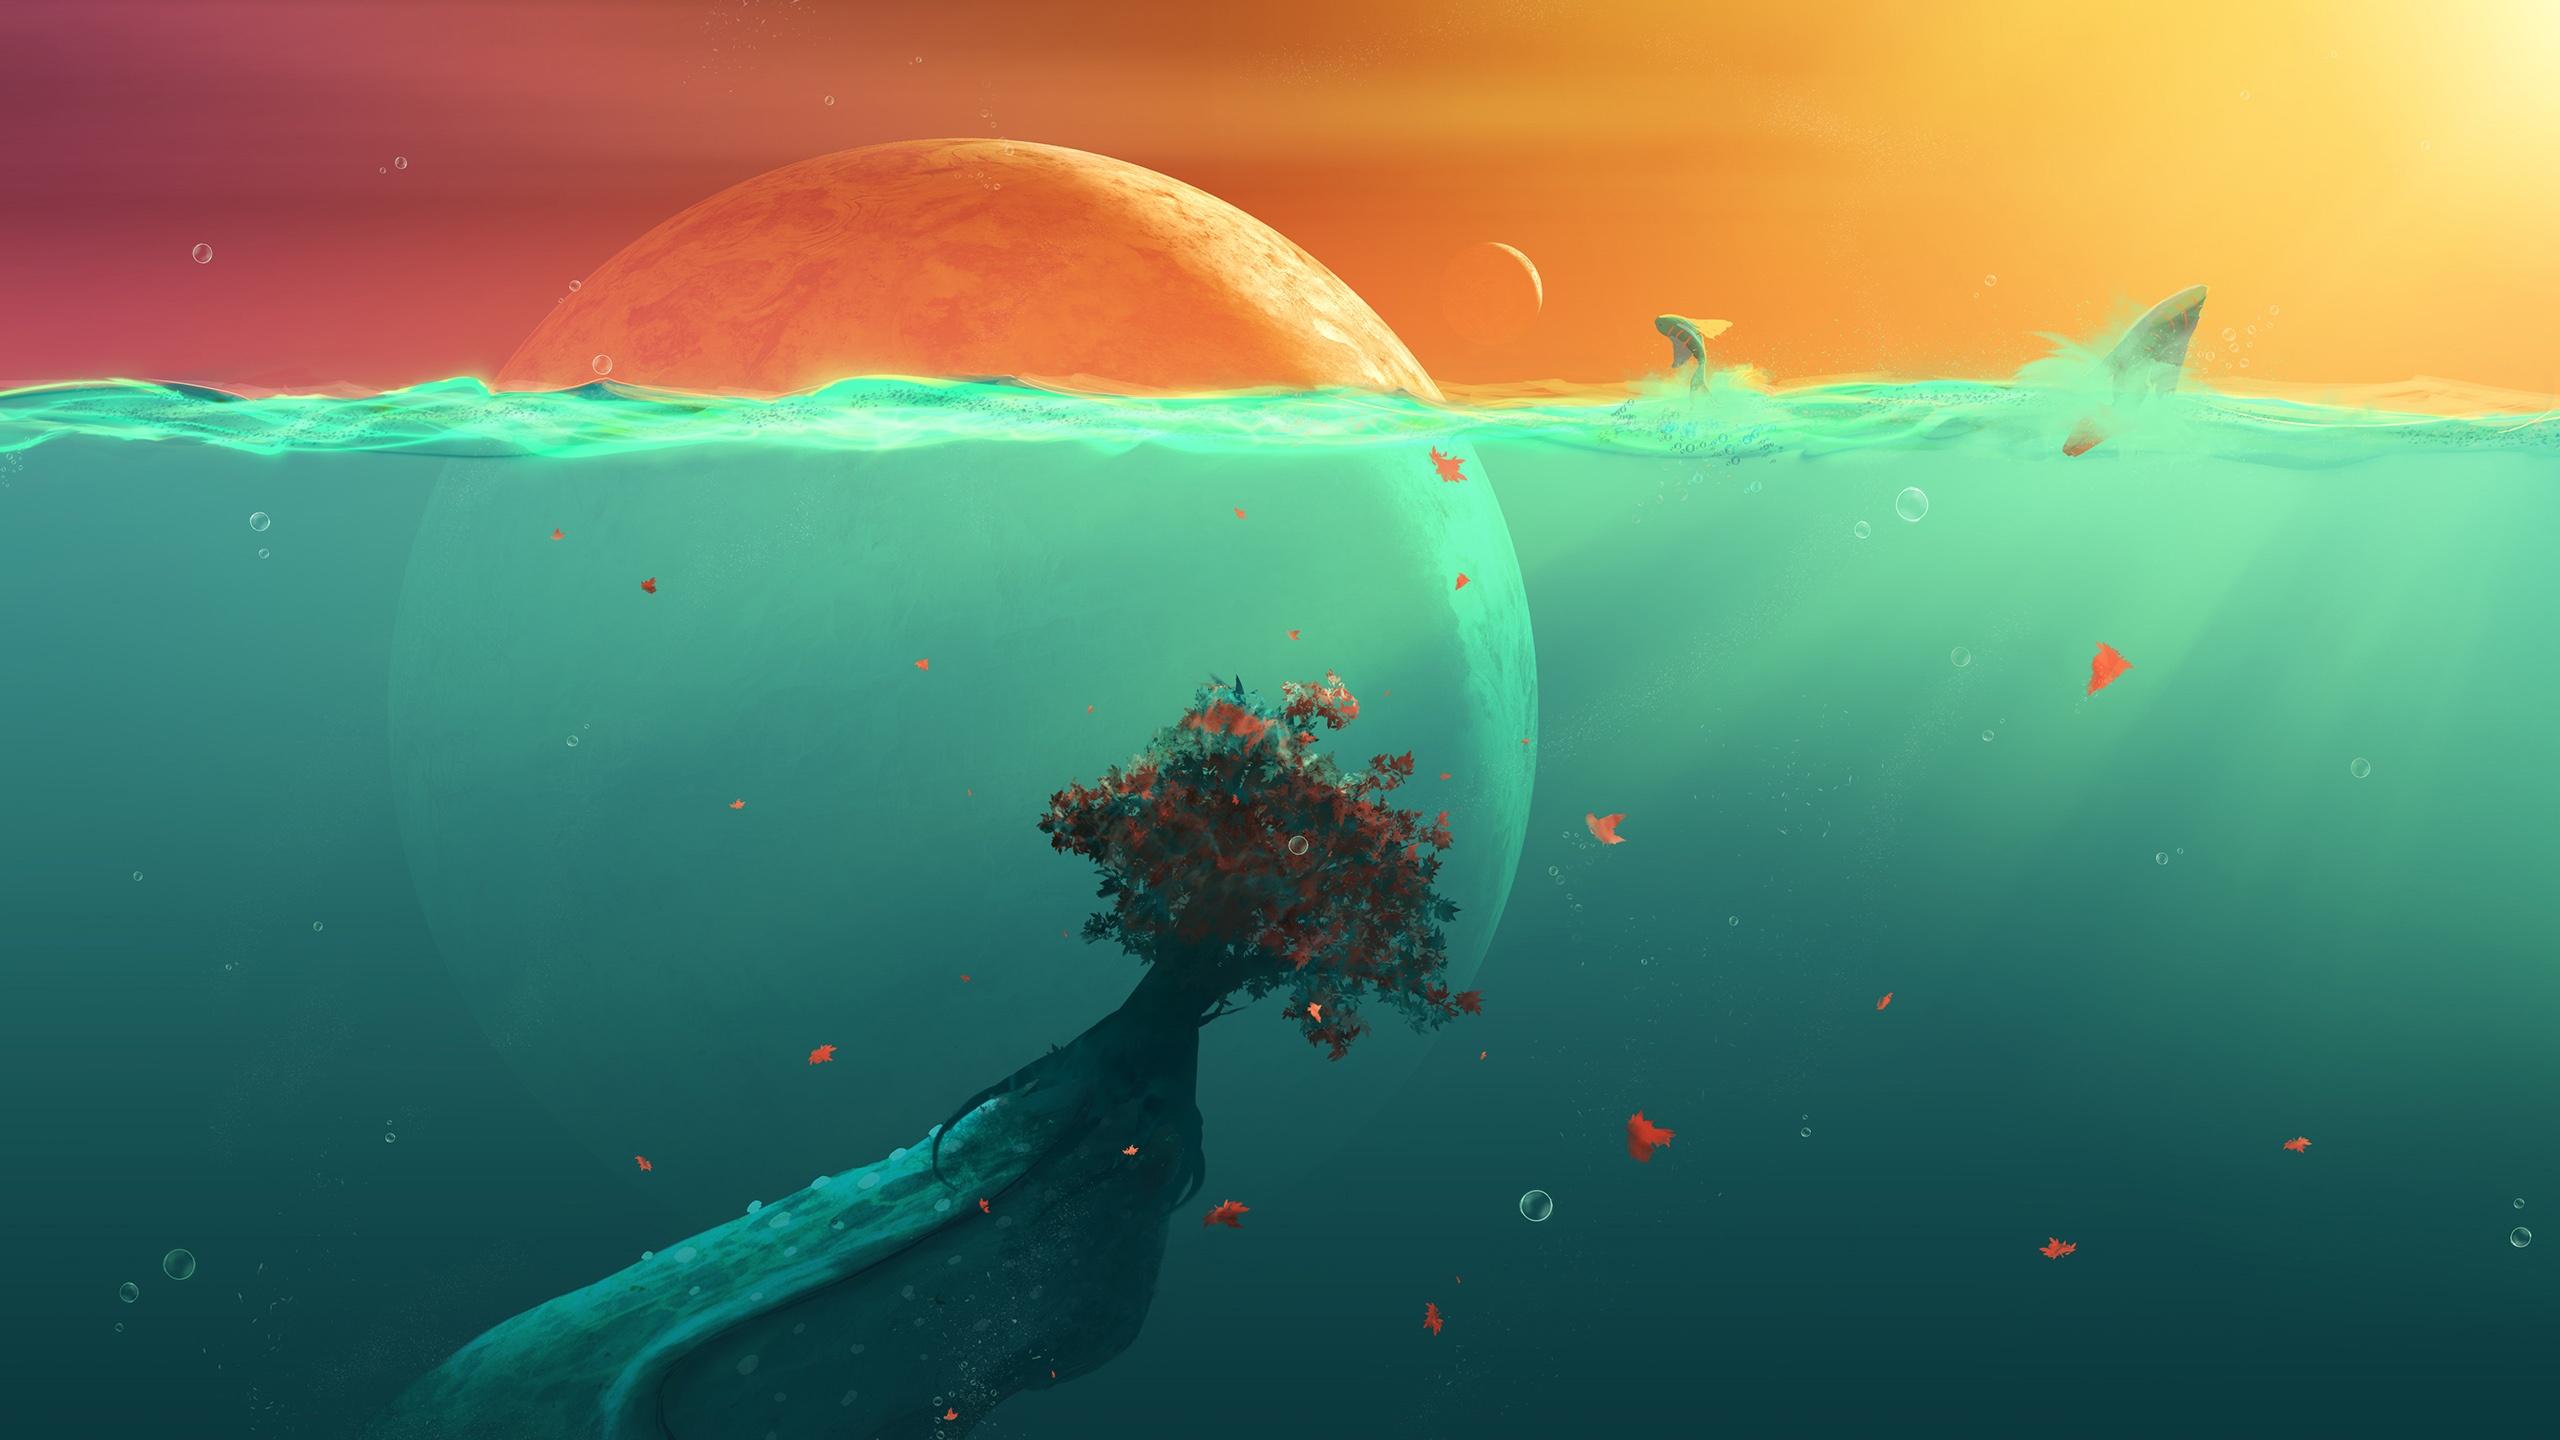 Deep Ocean Planet Fish Wallpapers